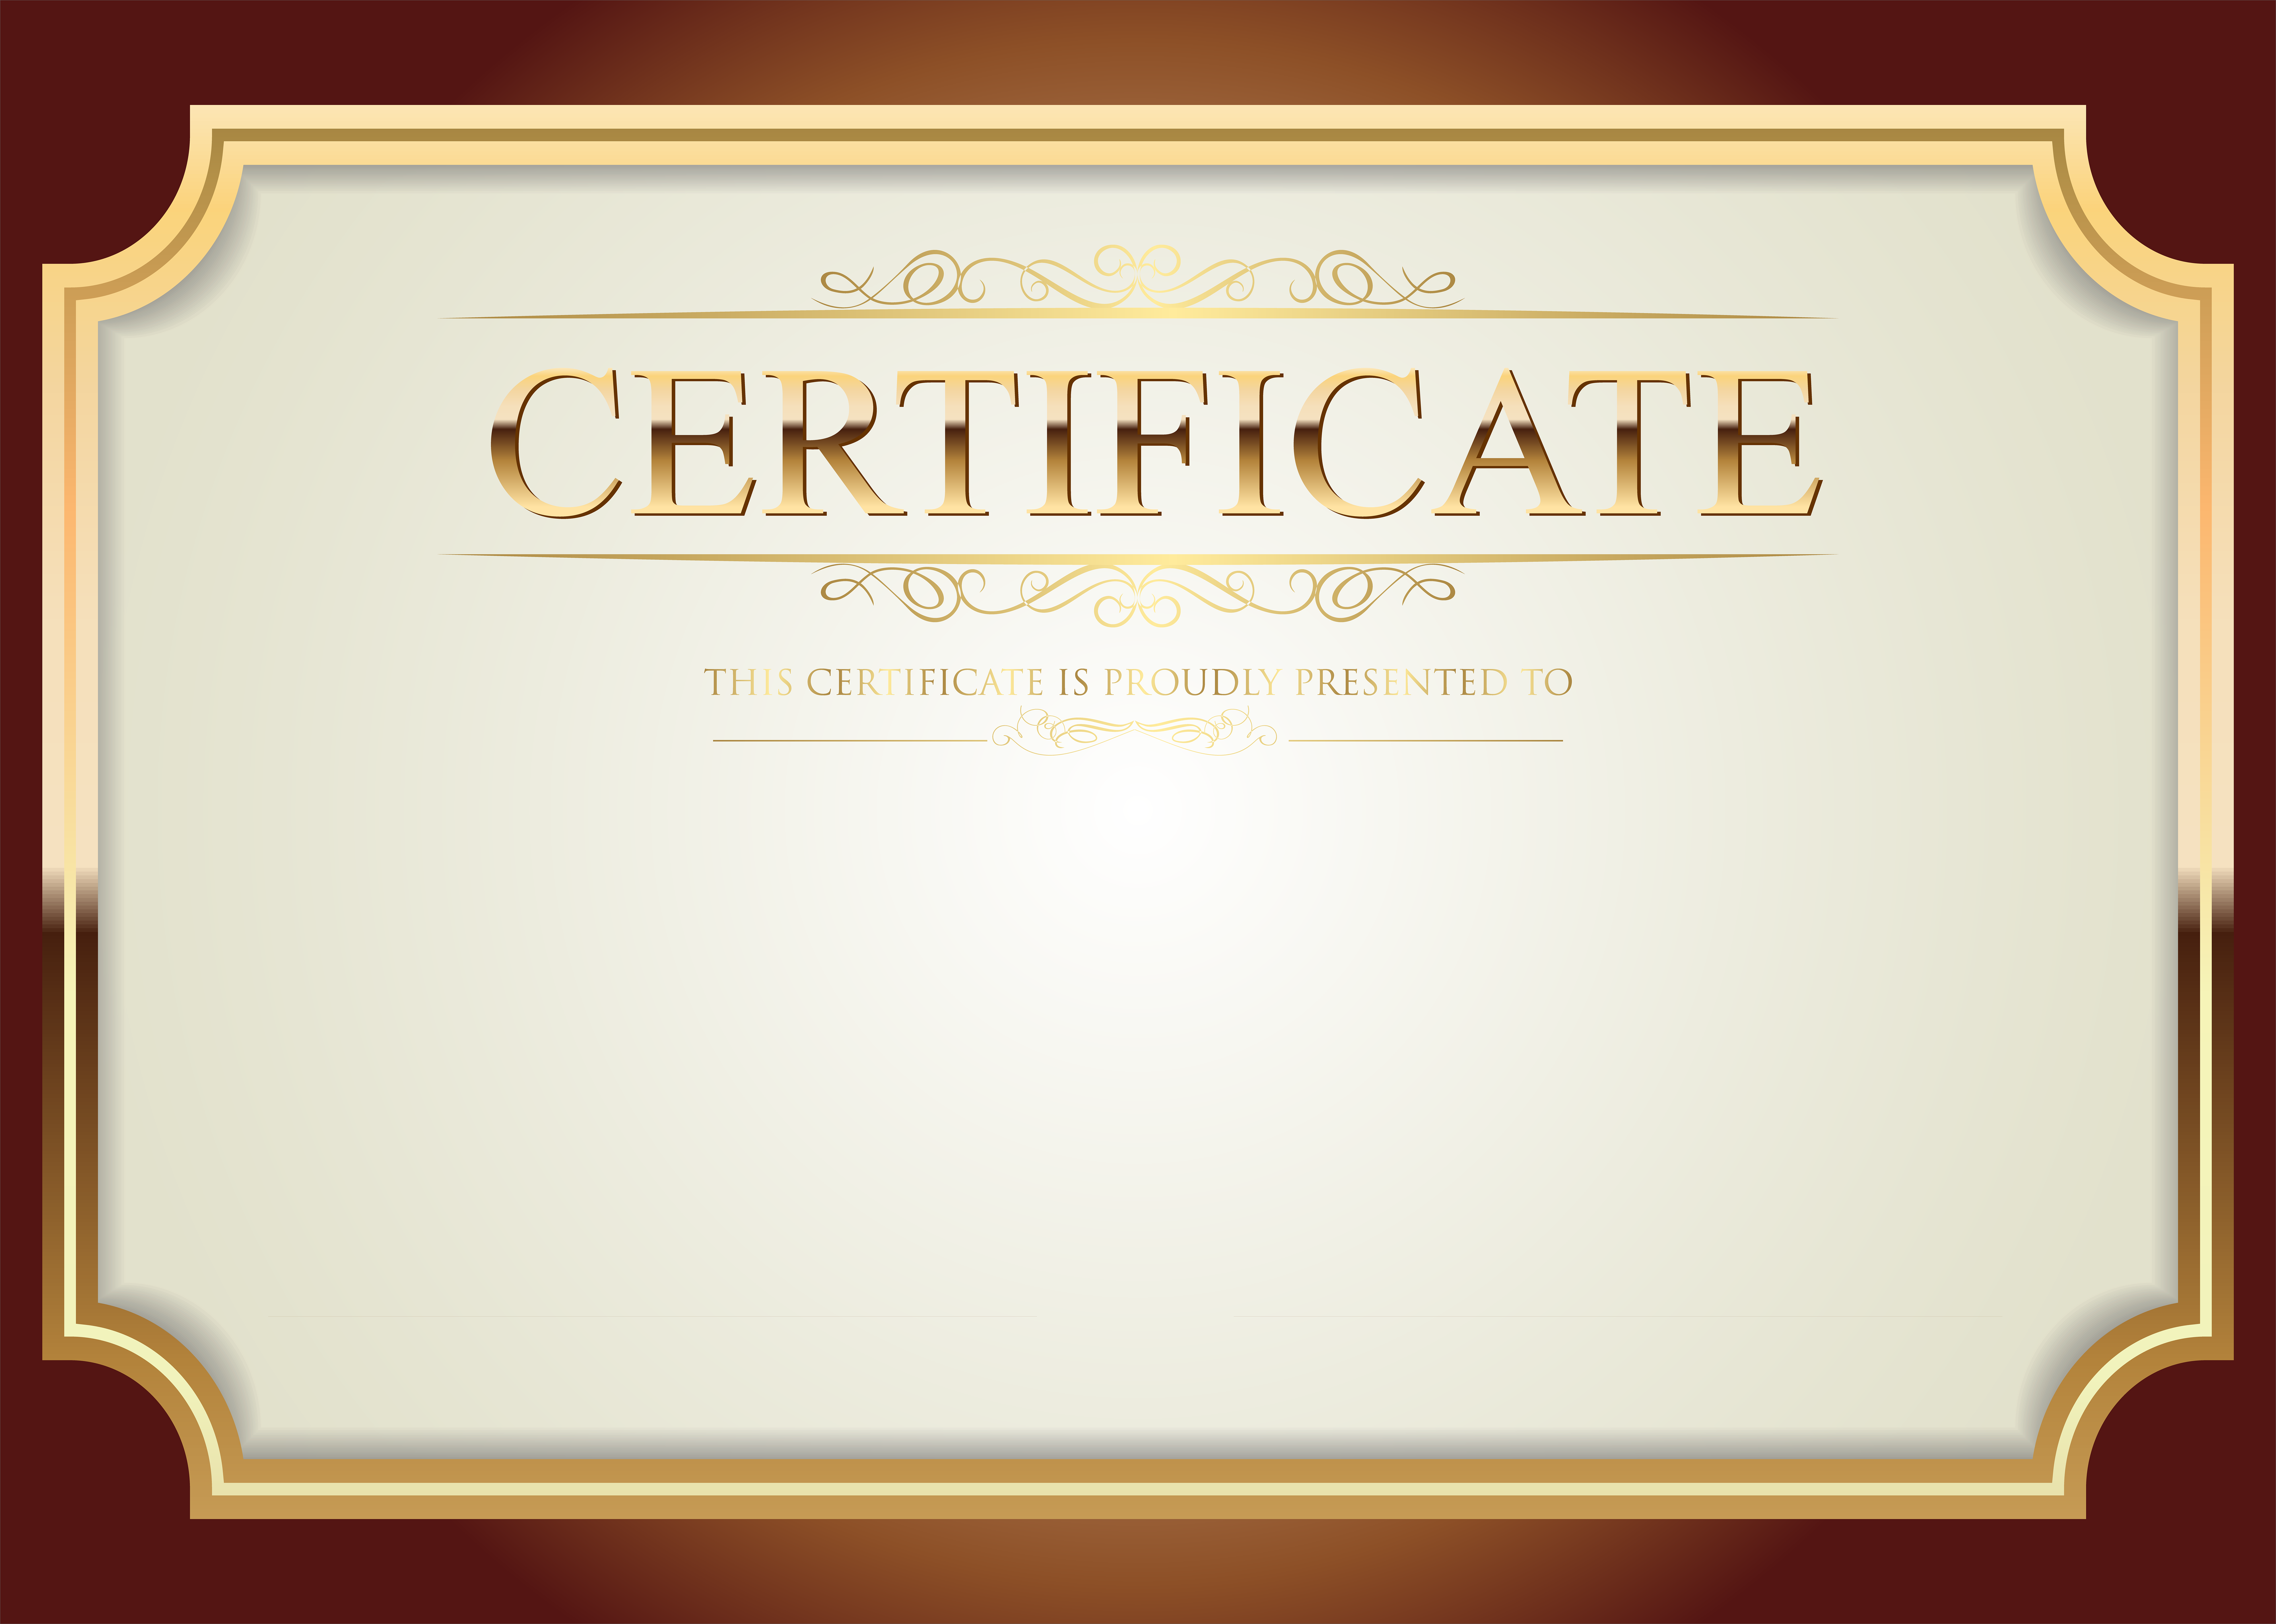 Certificate clipart certification. Template png clip art